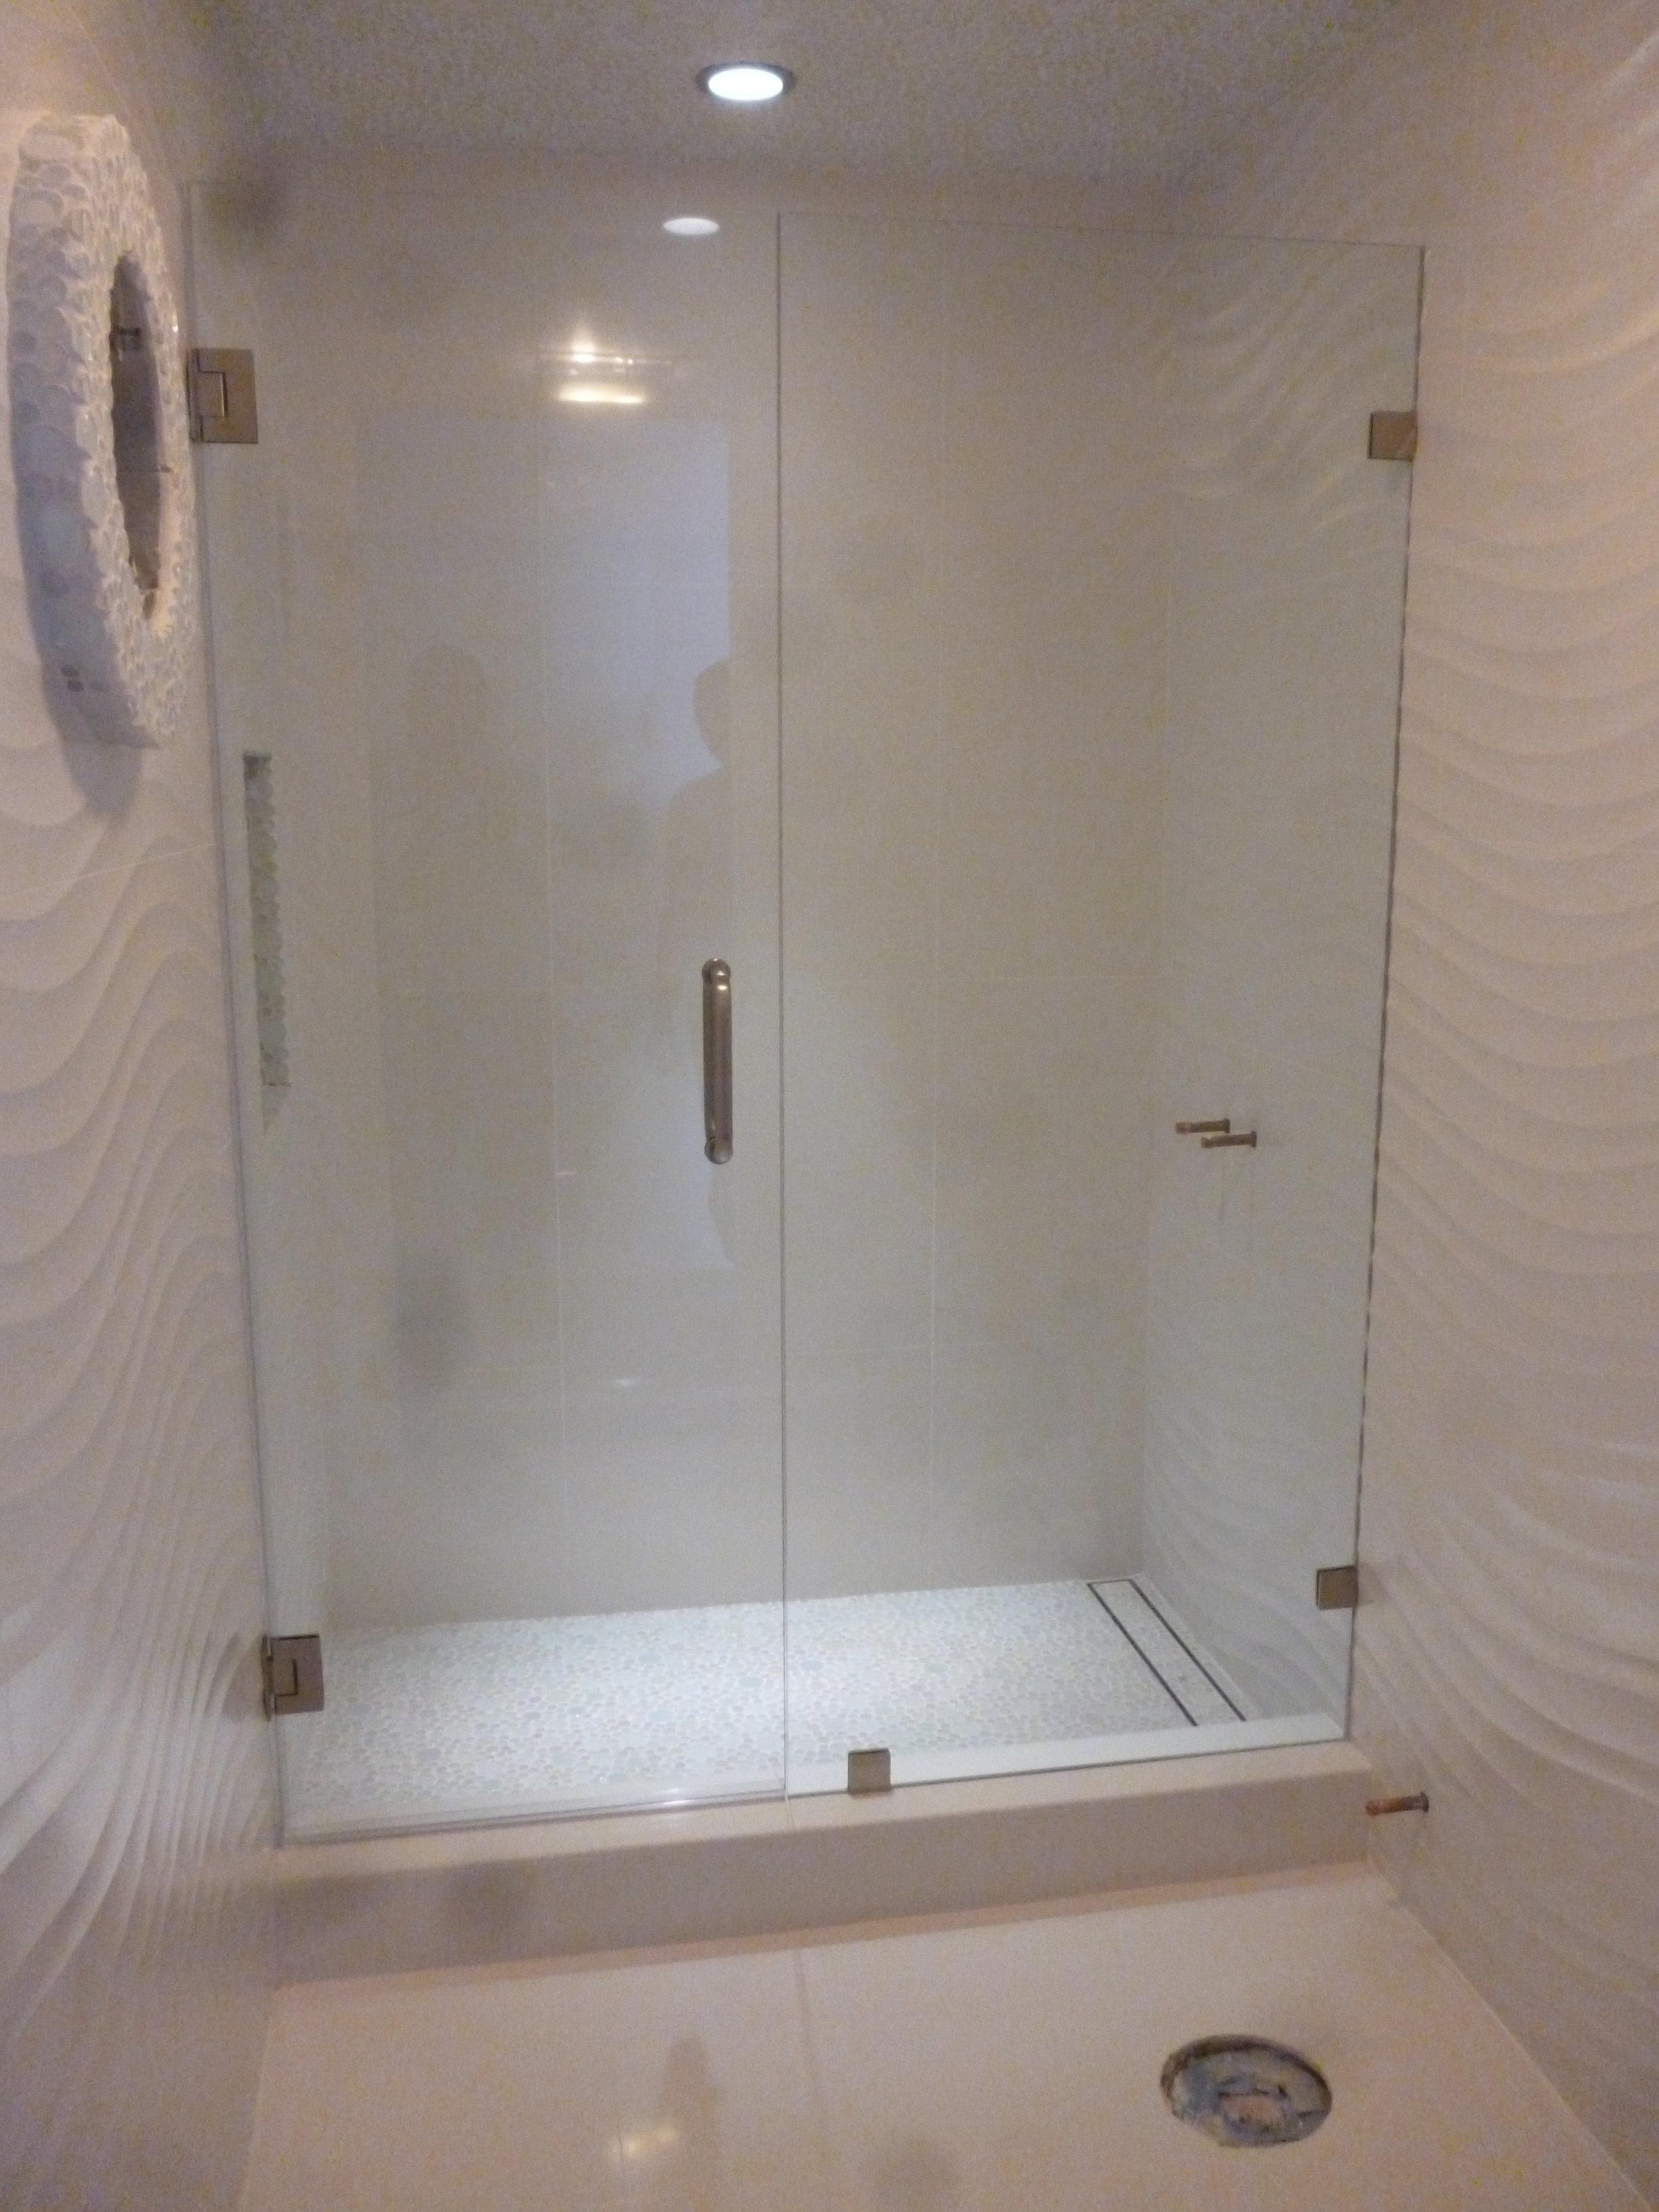 Shower-Doors-Residential-Photos-21.jpg